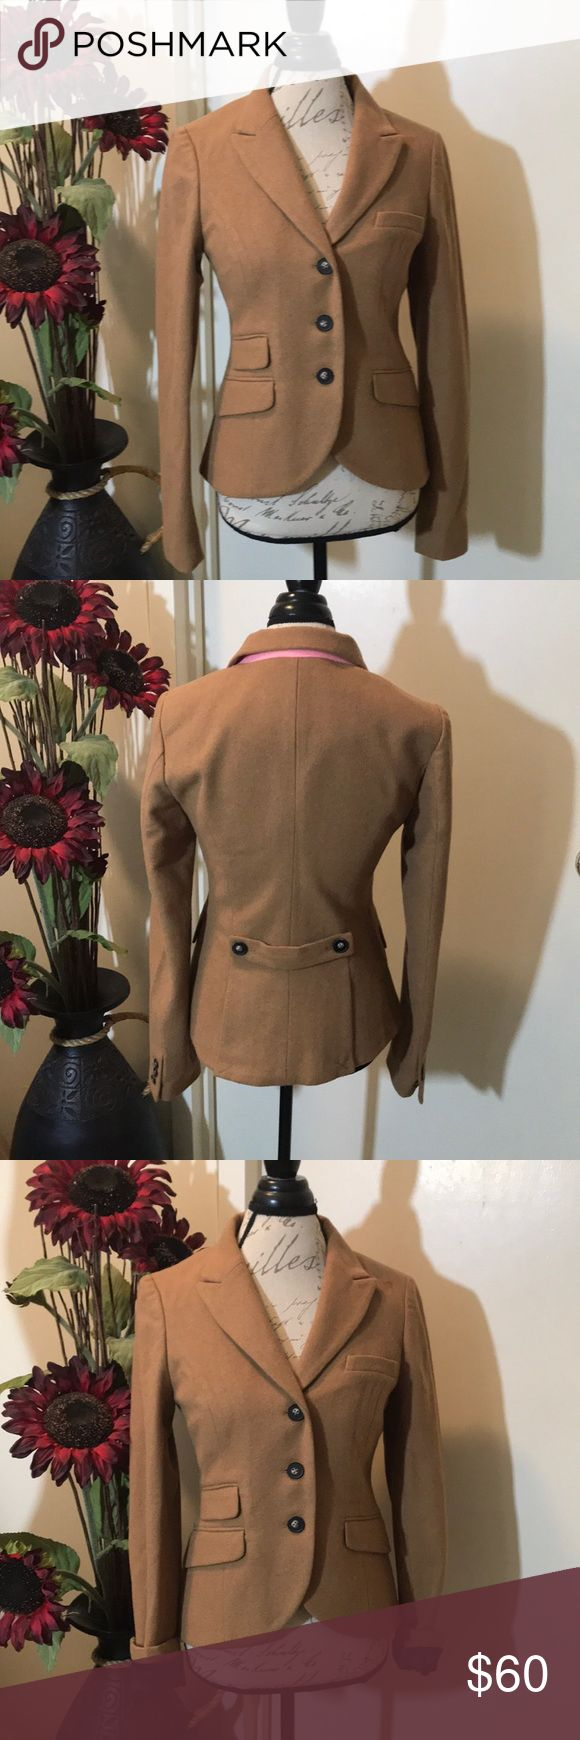 Jack Wills Jack Wills fabulously British wool blazer Jack Wills Jackets & Coats Blazers